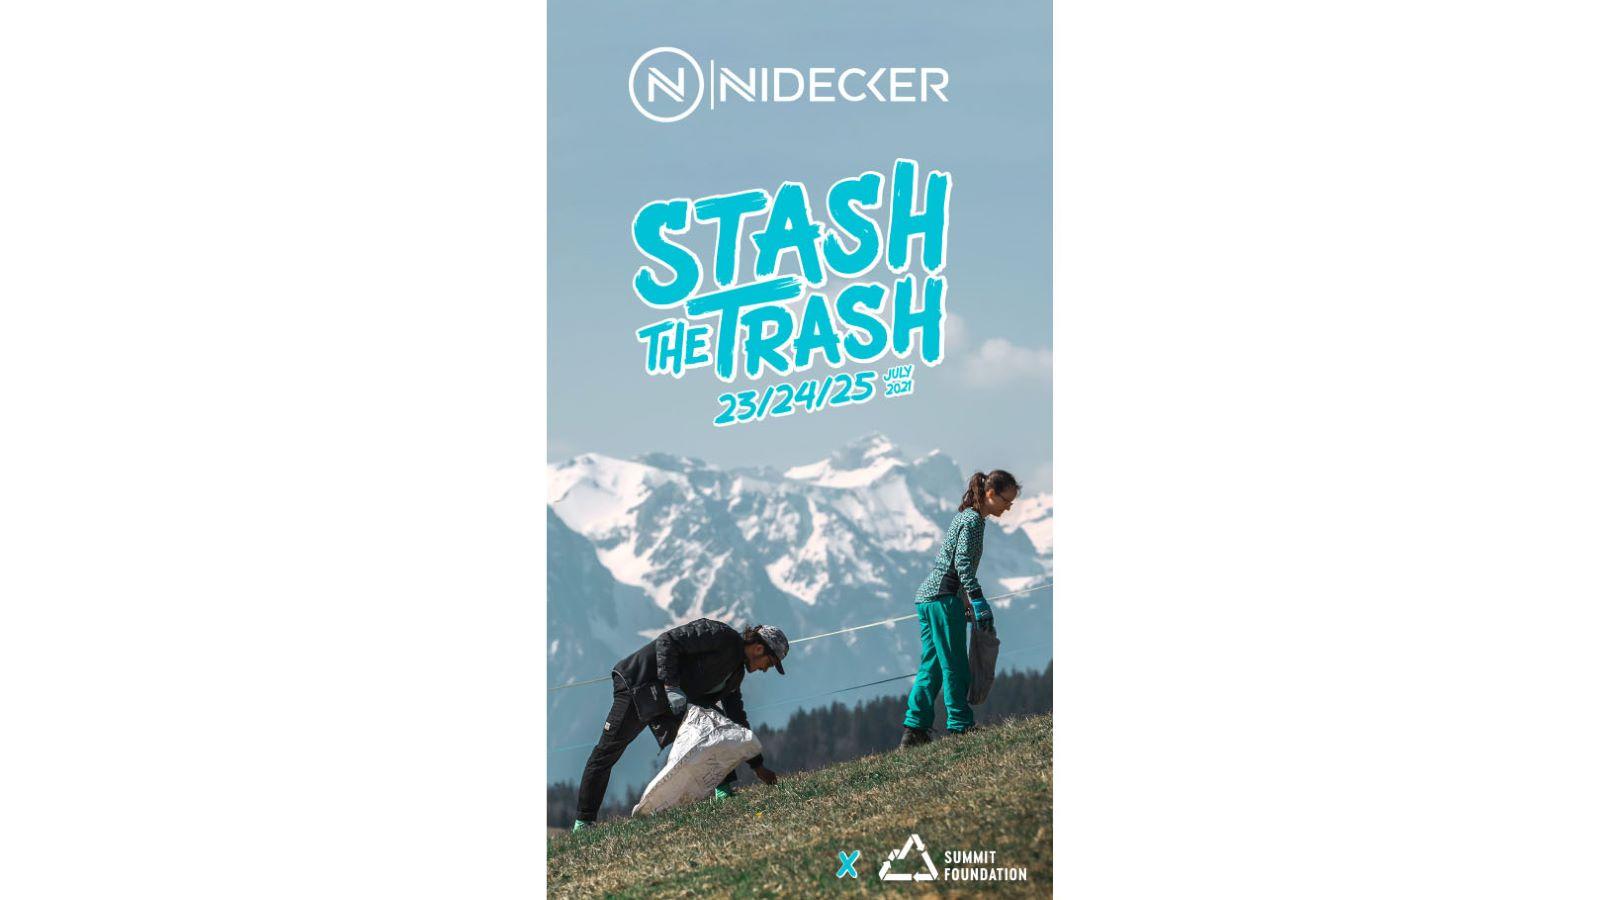 Stash the Trash event